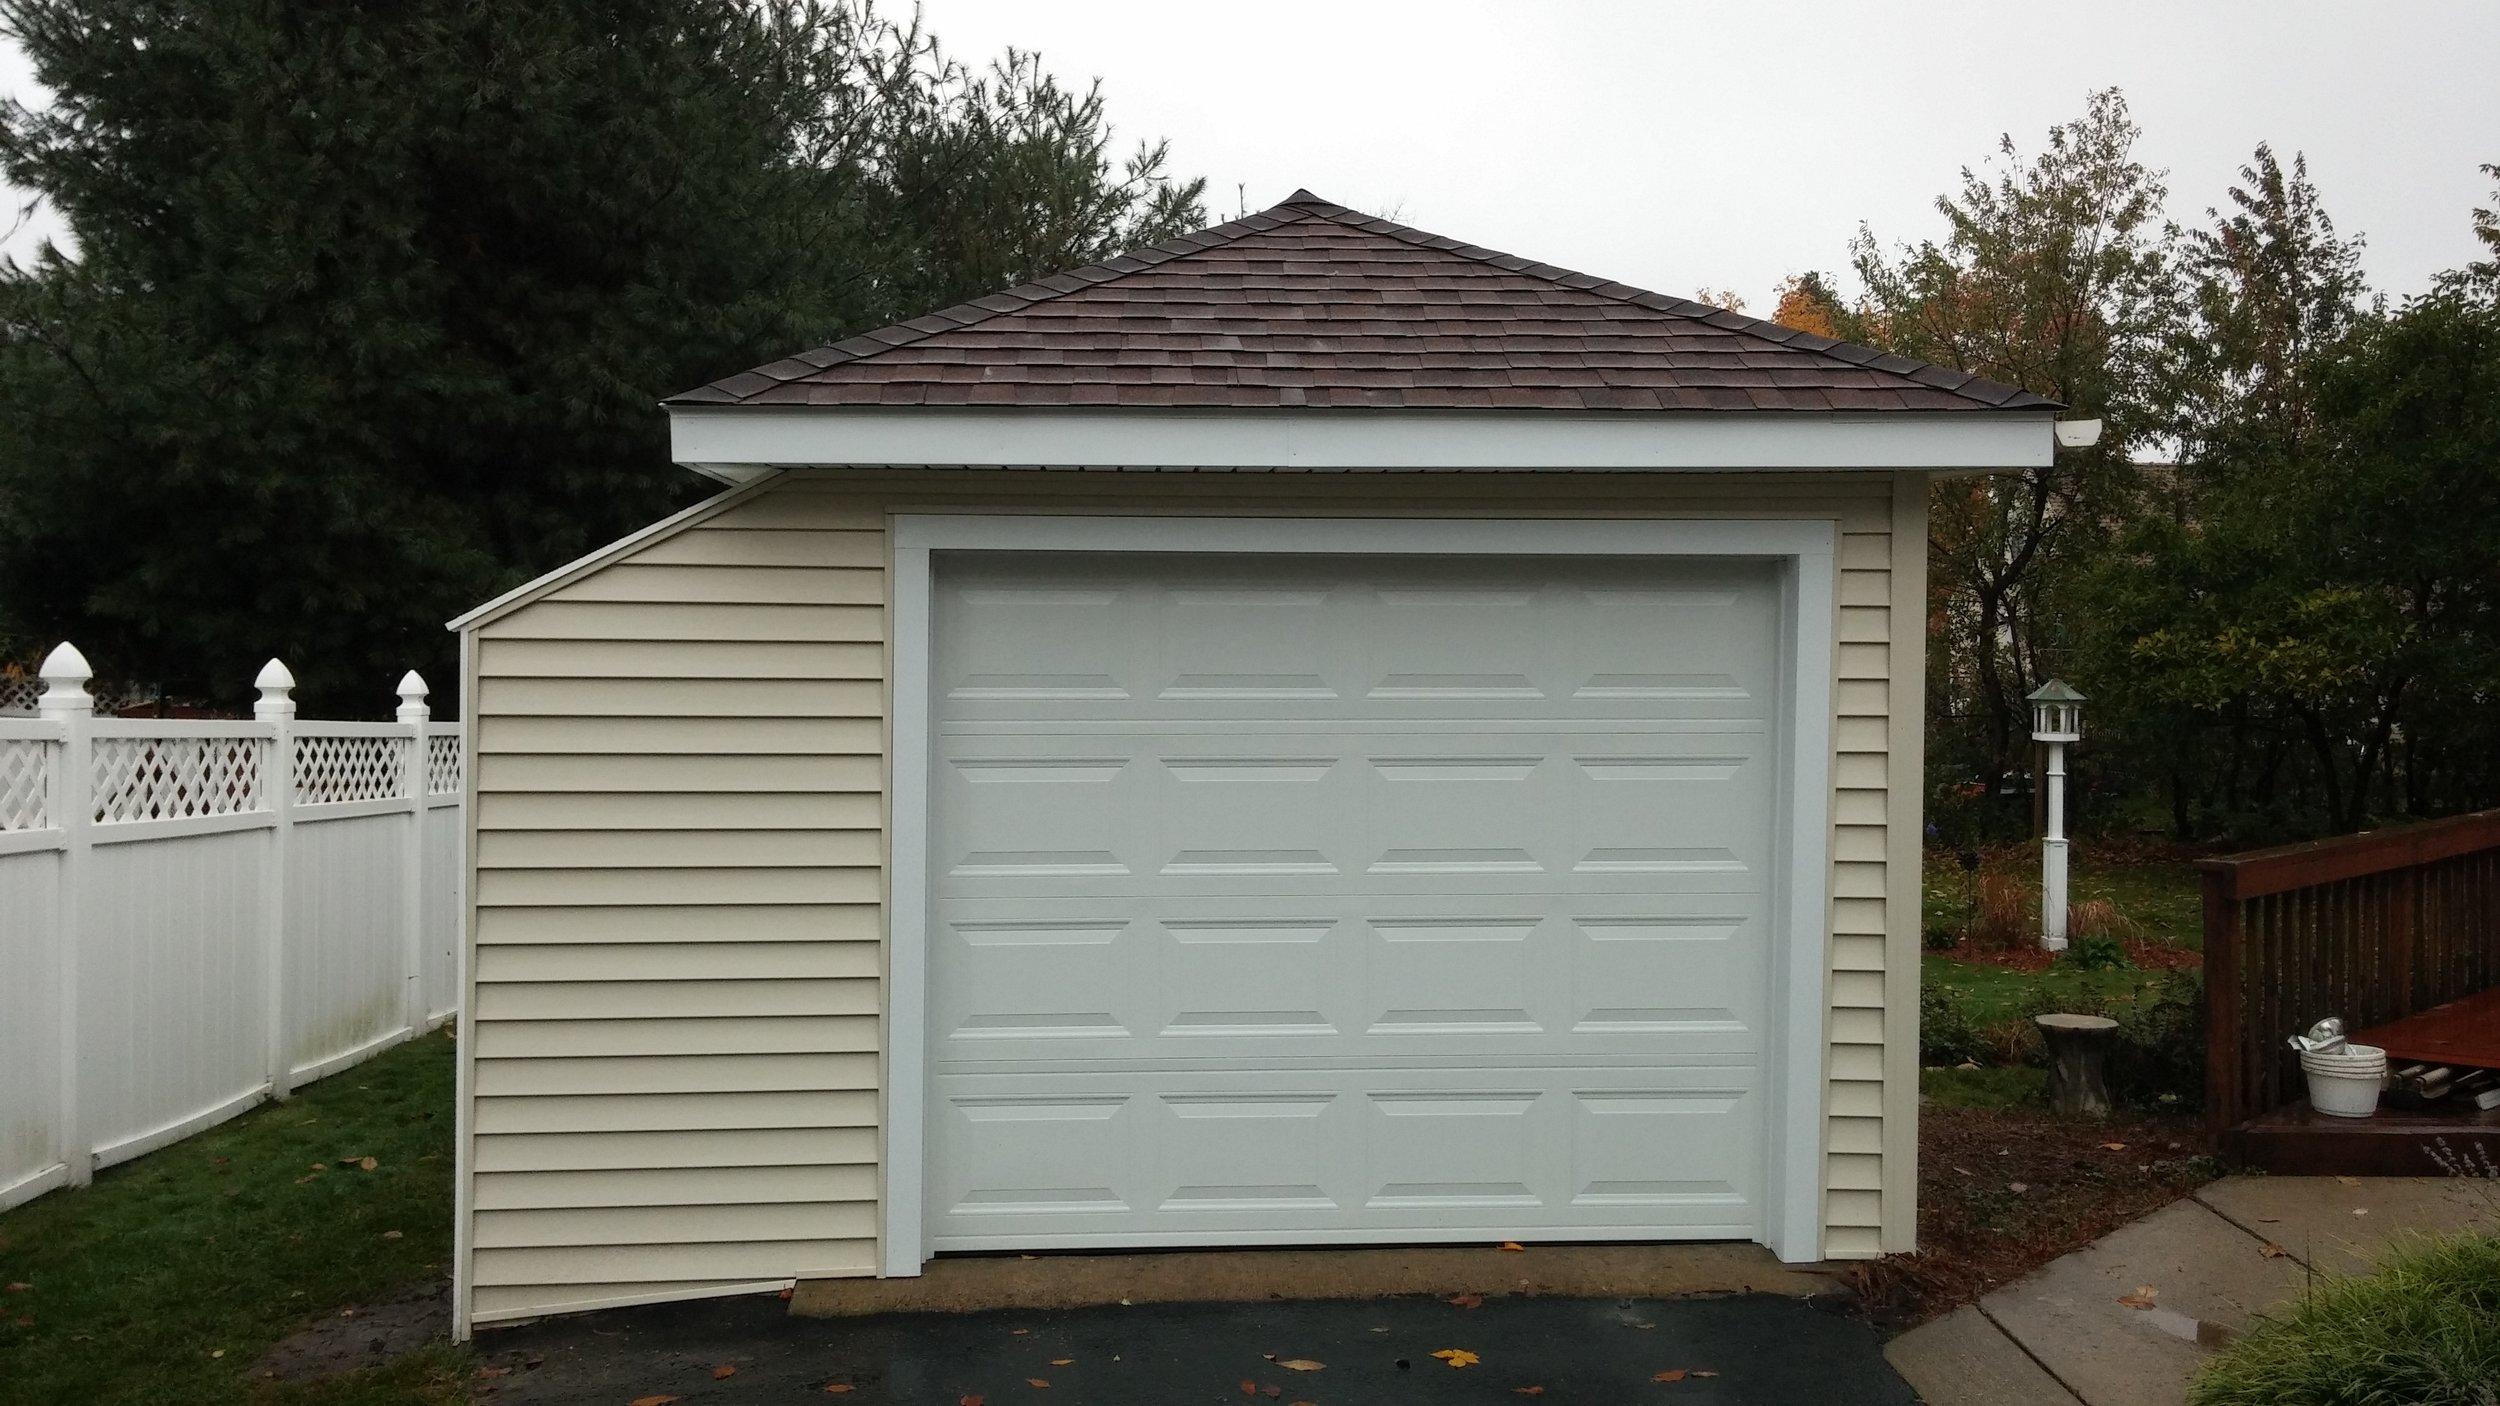 Fire Damage Garage Rebuild - Worcester MA